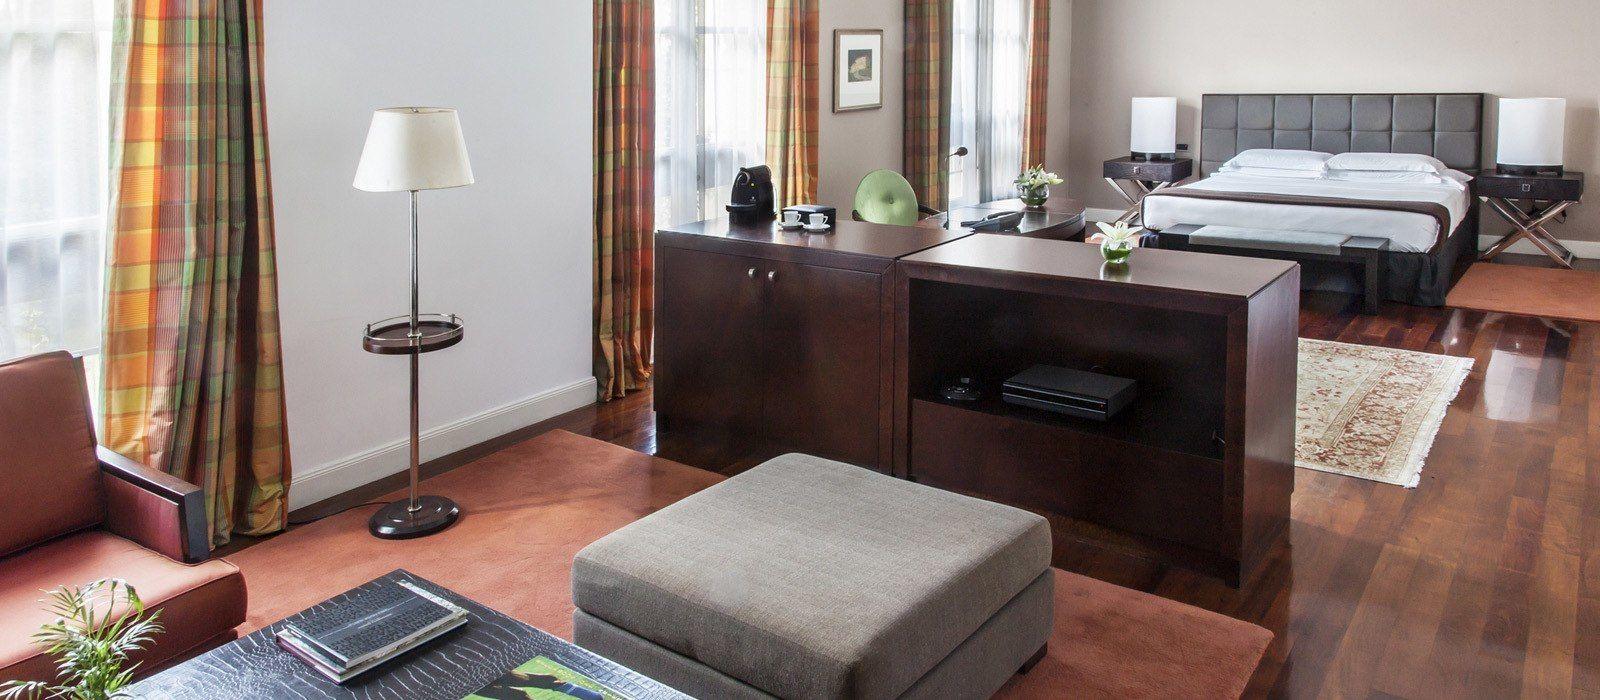 Hotel Palacio Duhau – Park Hyatt Argentinien